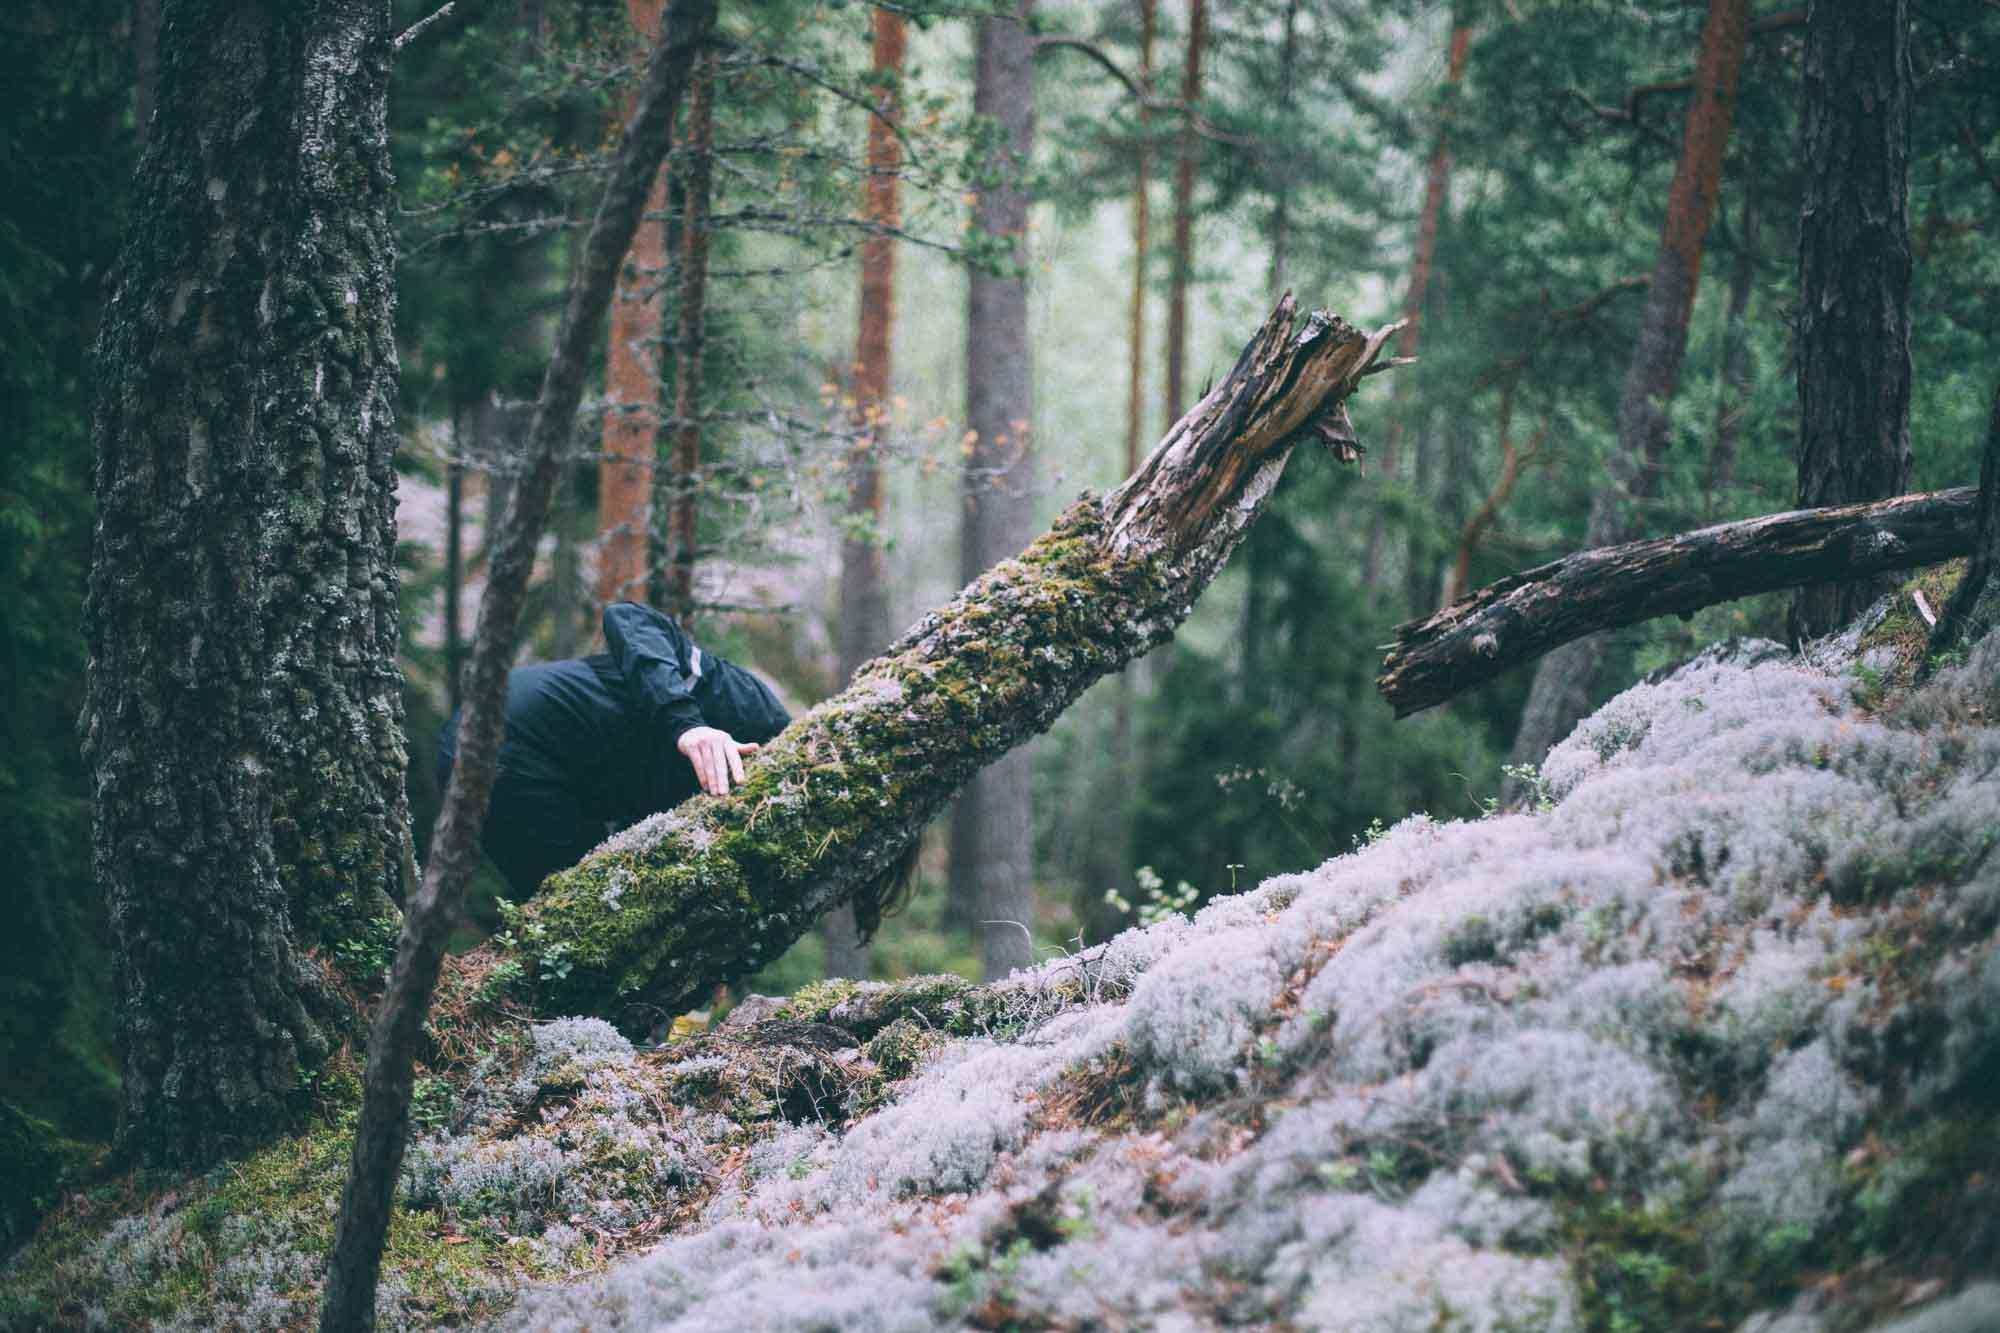 Sven bakom träd